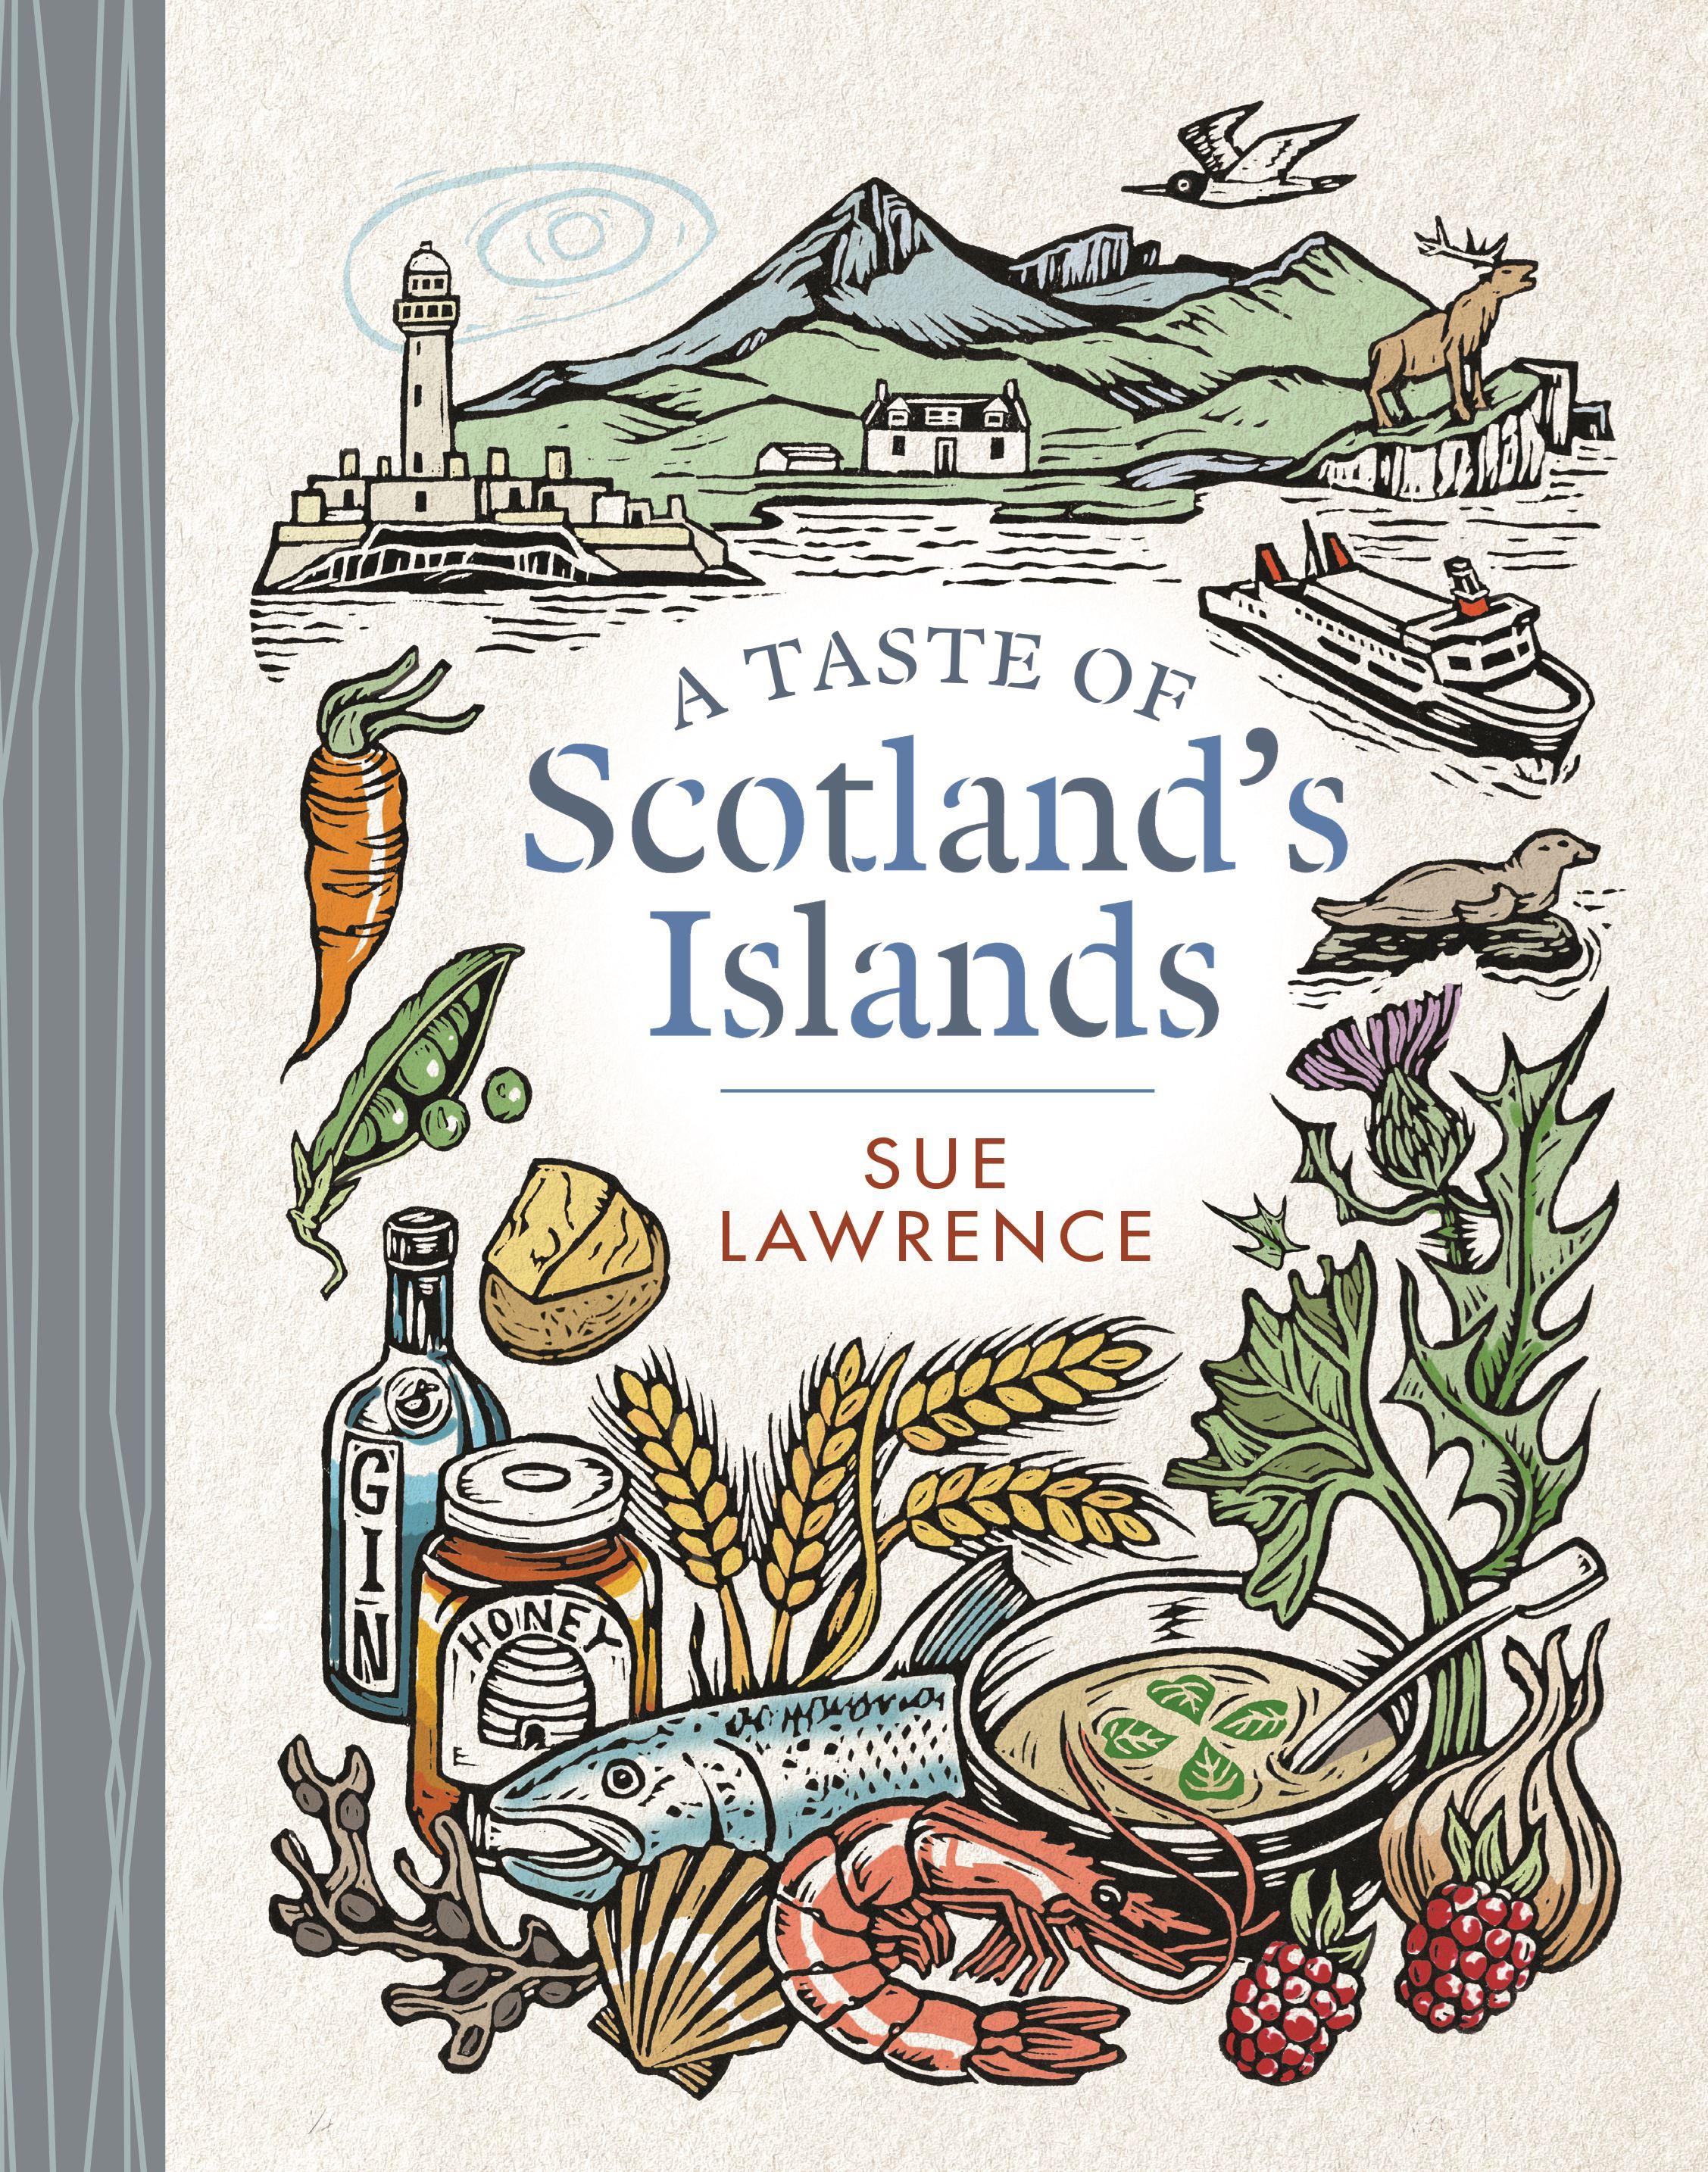 A Taste Of Scotland's Islands (Book)